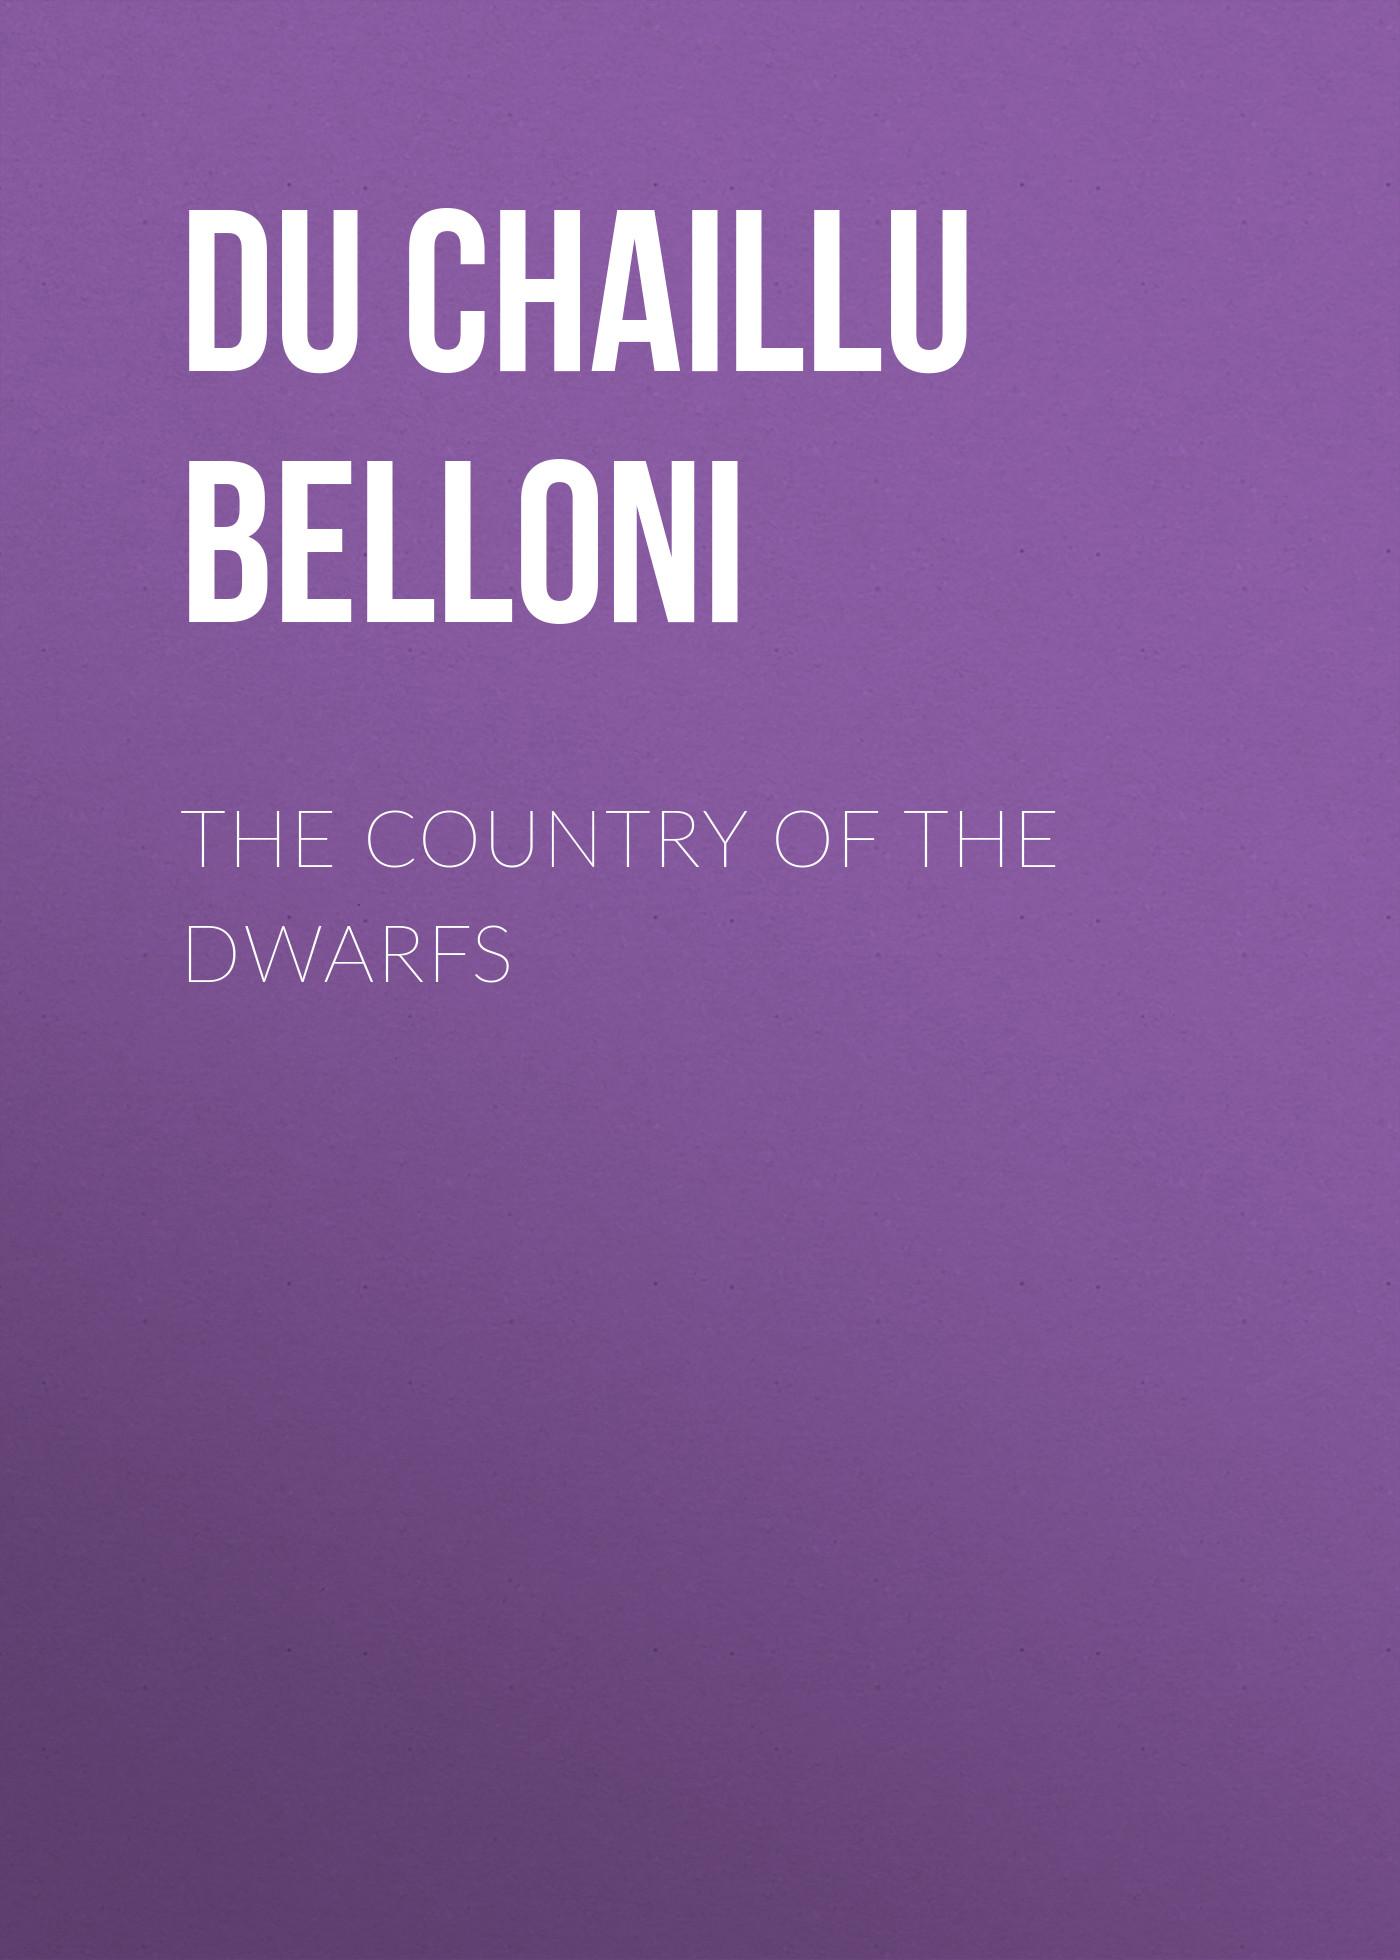 лучшая цена Du Chaillu Paul Belloni The Country of the Dwarfs